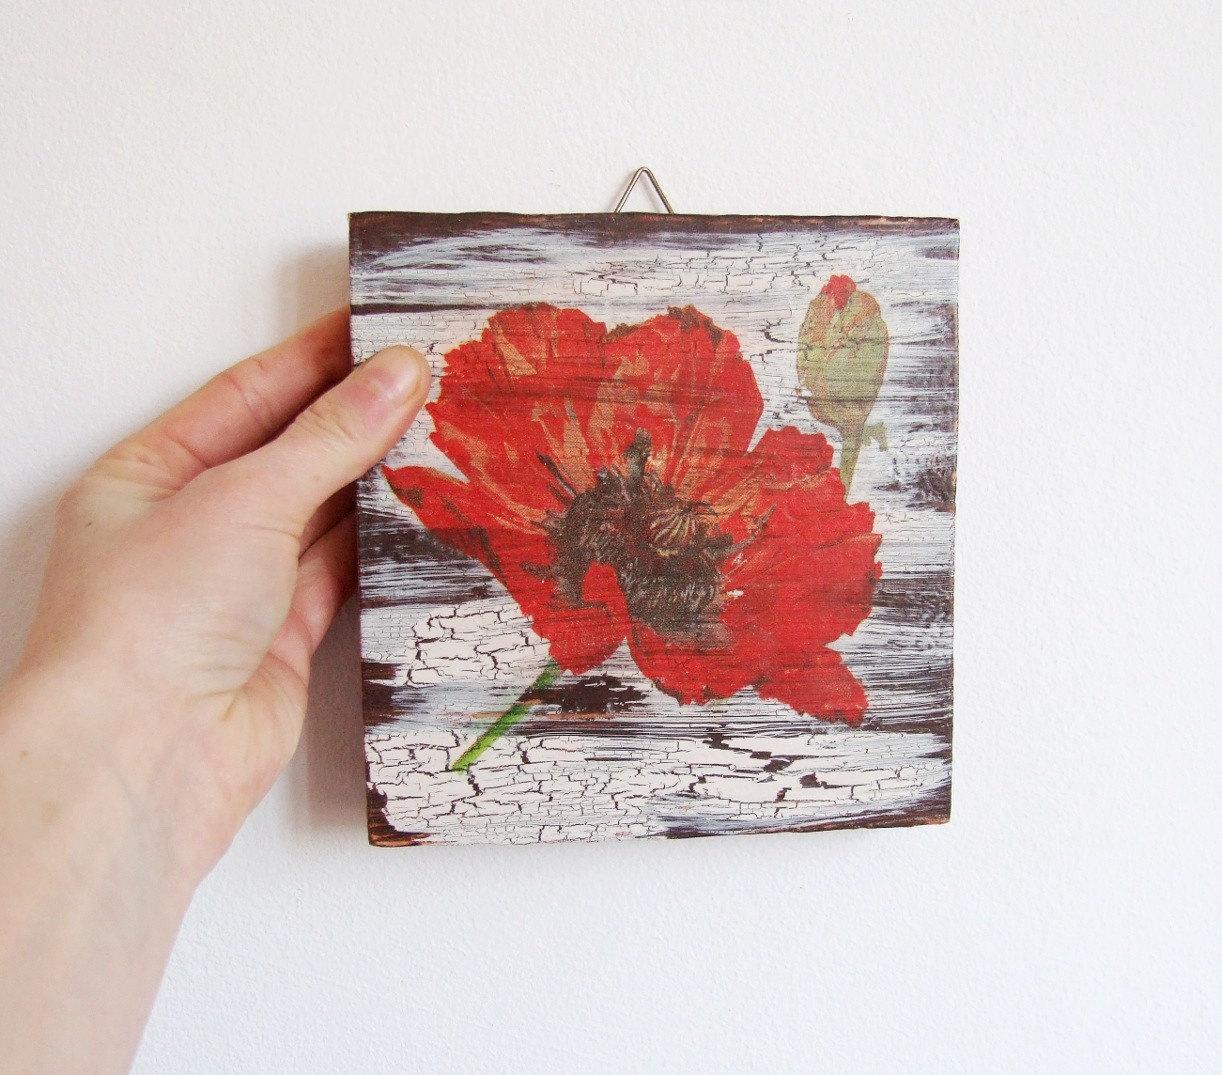 Red Poppy Wall Decor : Poppy wall decor red poppies art decoupage by woodlandhut